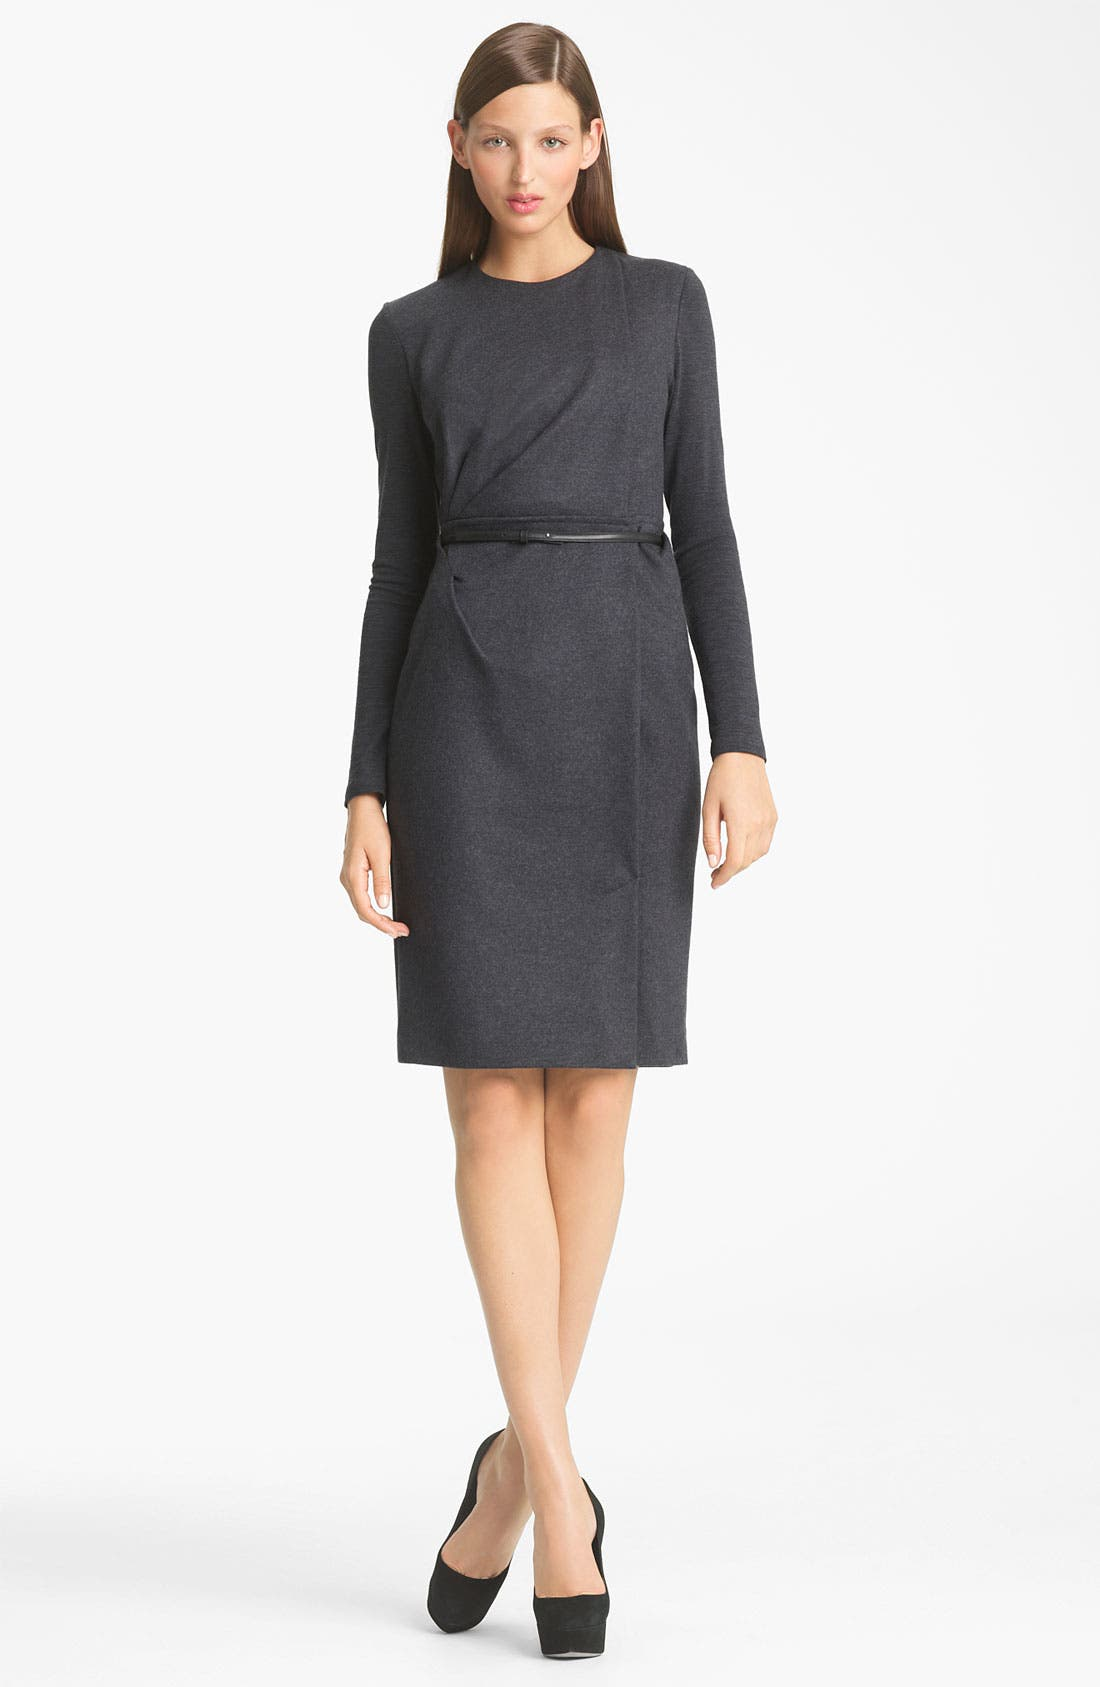 Main Image - Max Mara 'Santos' Belted Wool Jersey Dress